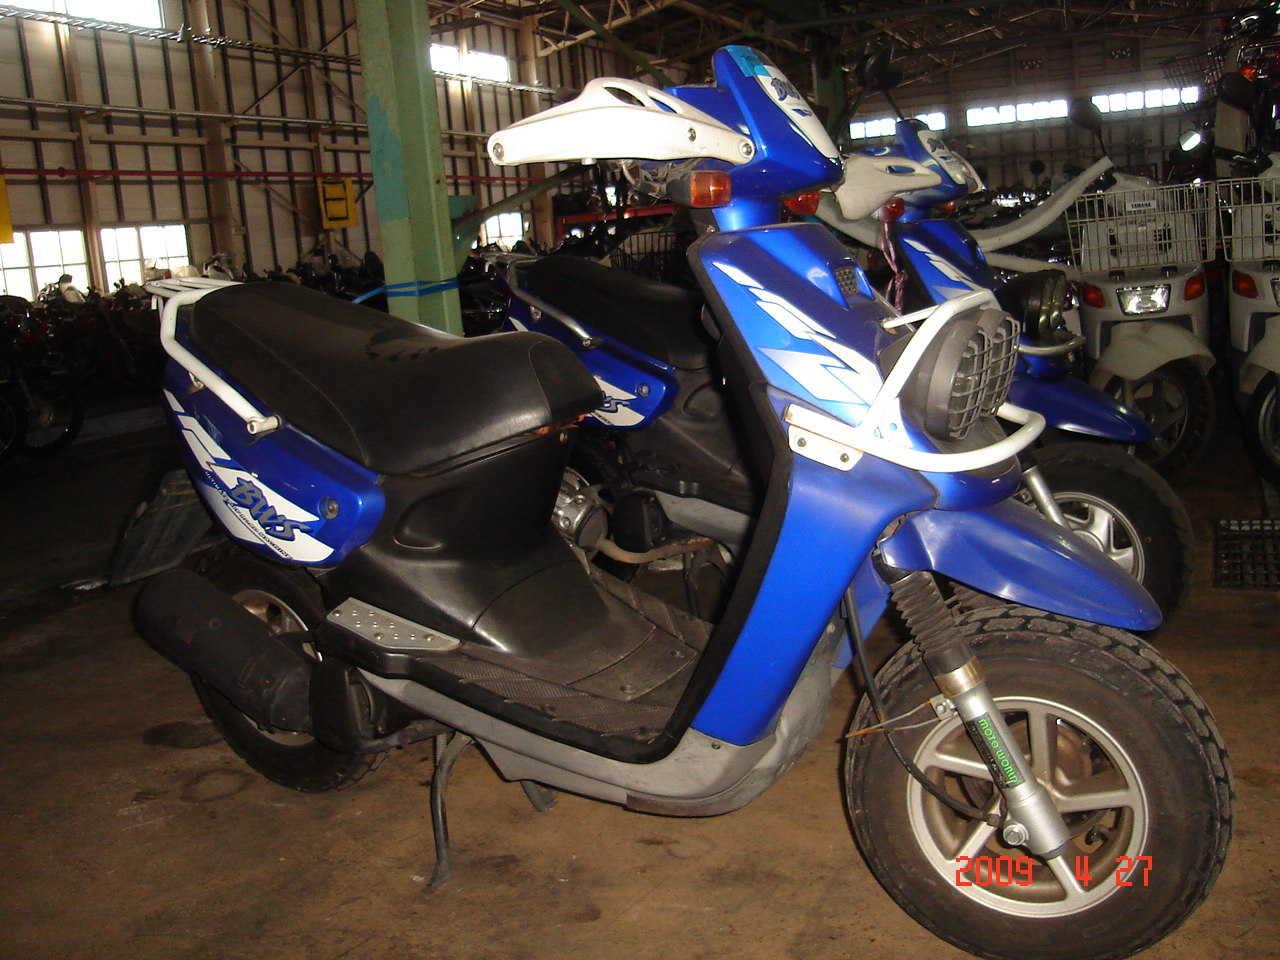 Yamaha MT-10 Specs & Pricing Finally Revealed